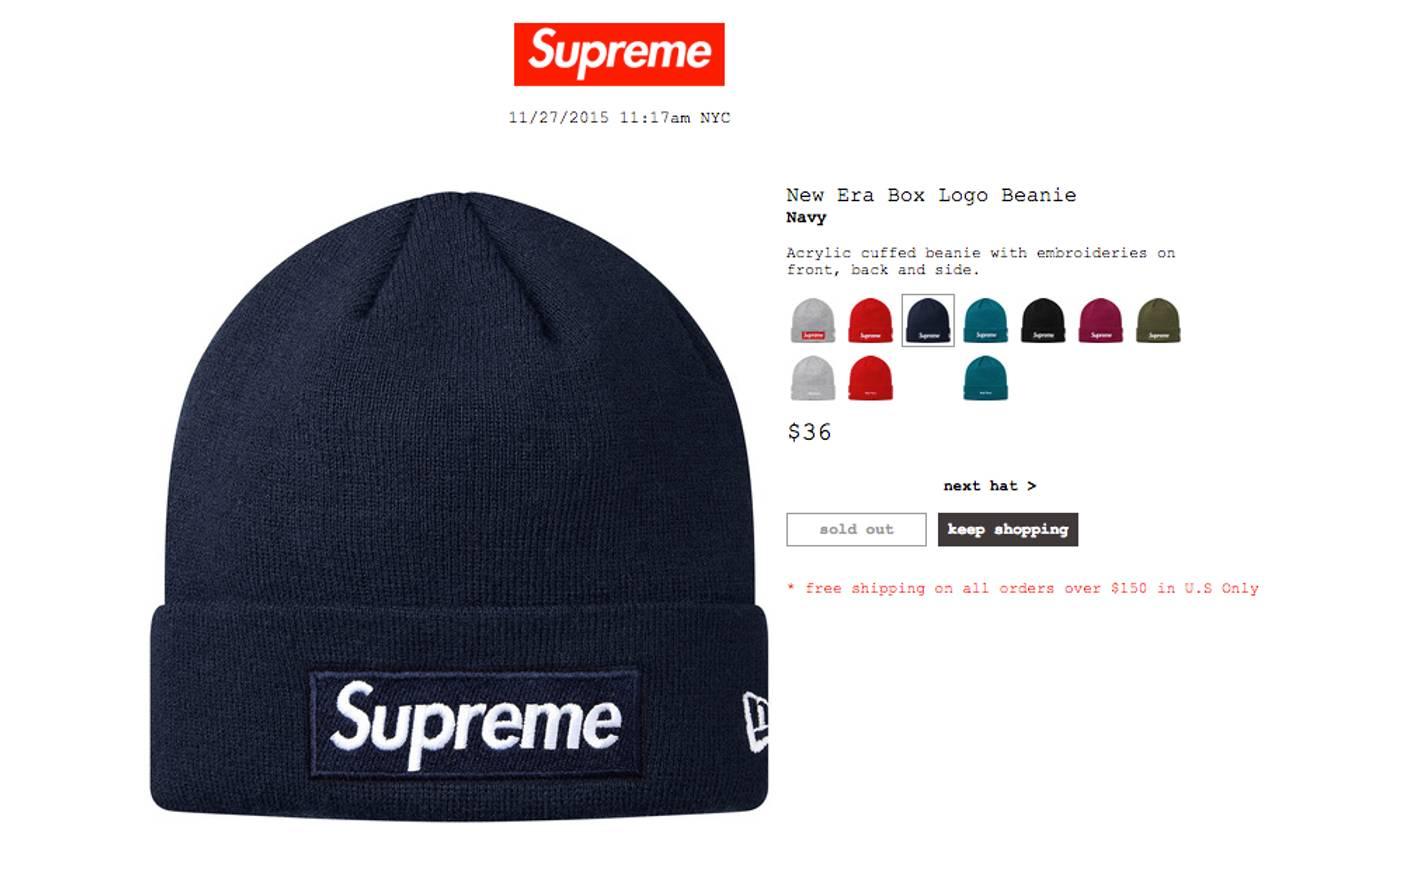 2de906761f4c3 shopping supreme new era box logo beaniefw17ice blue 4beca d23f6  new  zealand supreme supreme bogo beanie navy size one size 07803 82d52